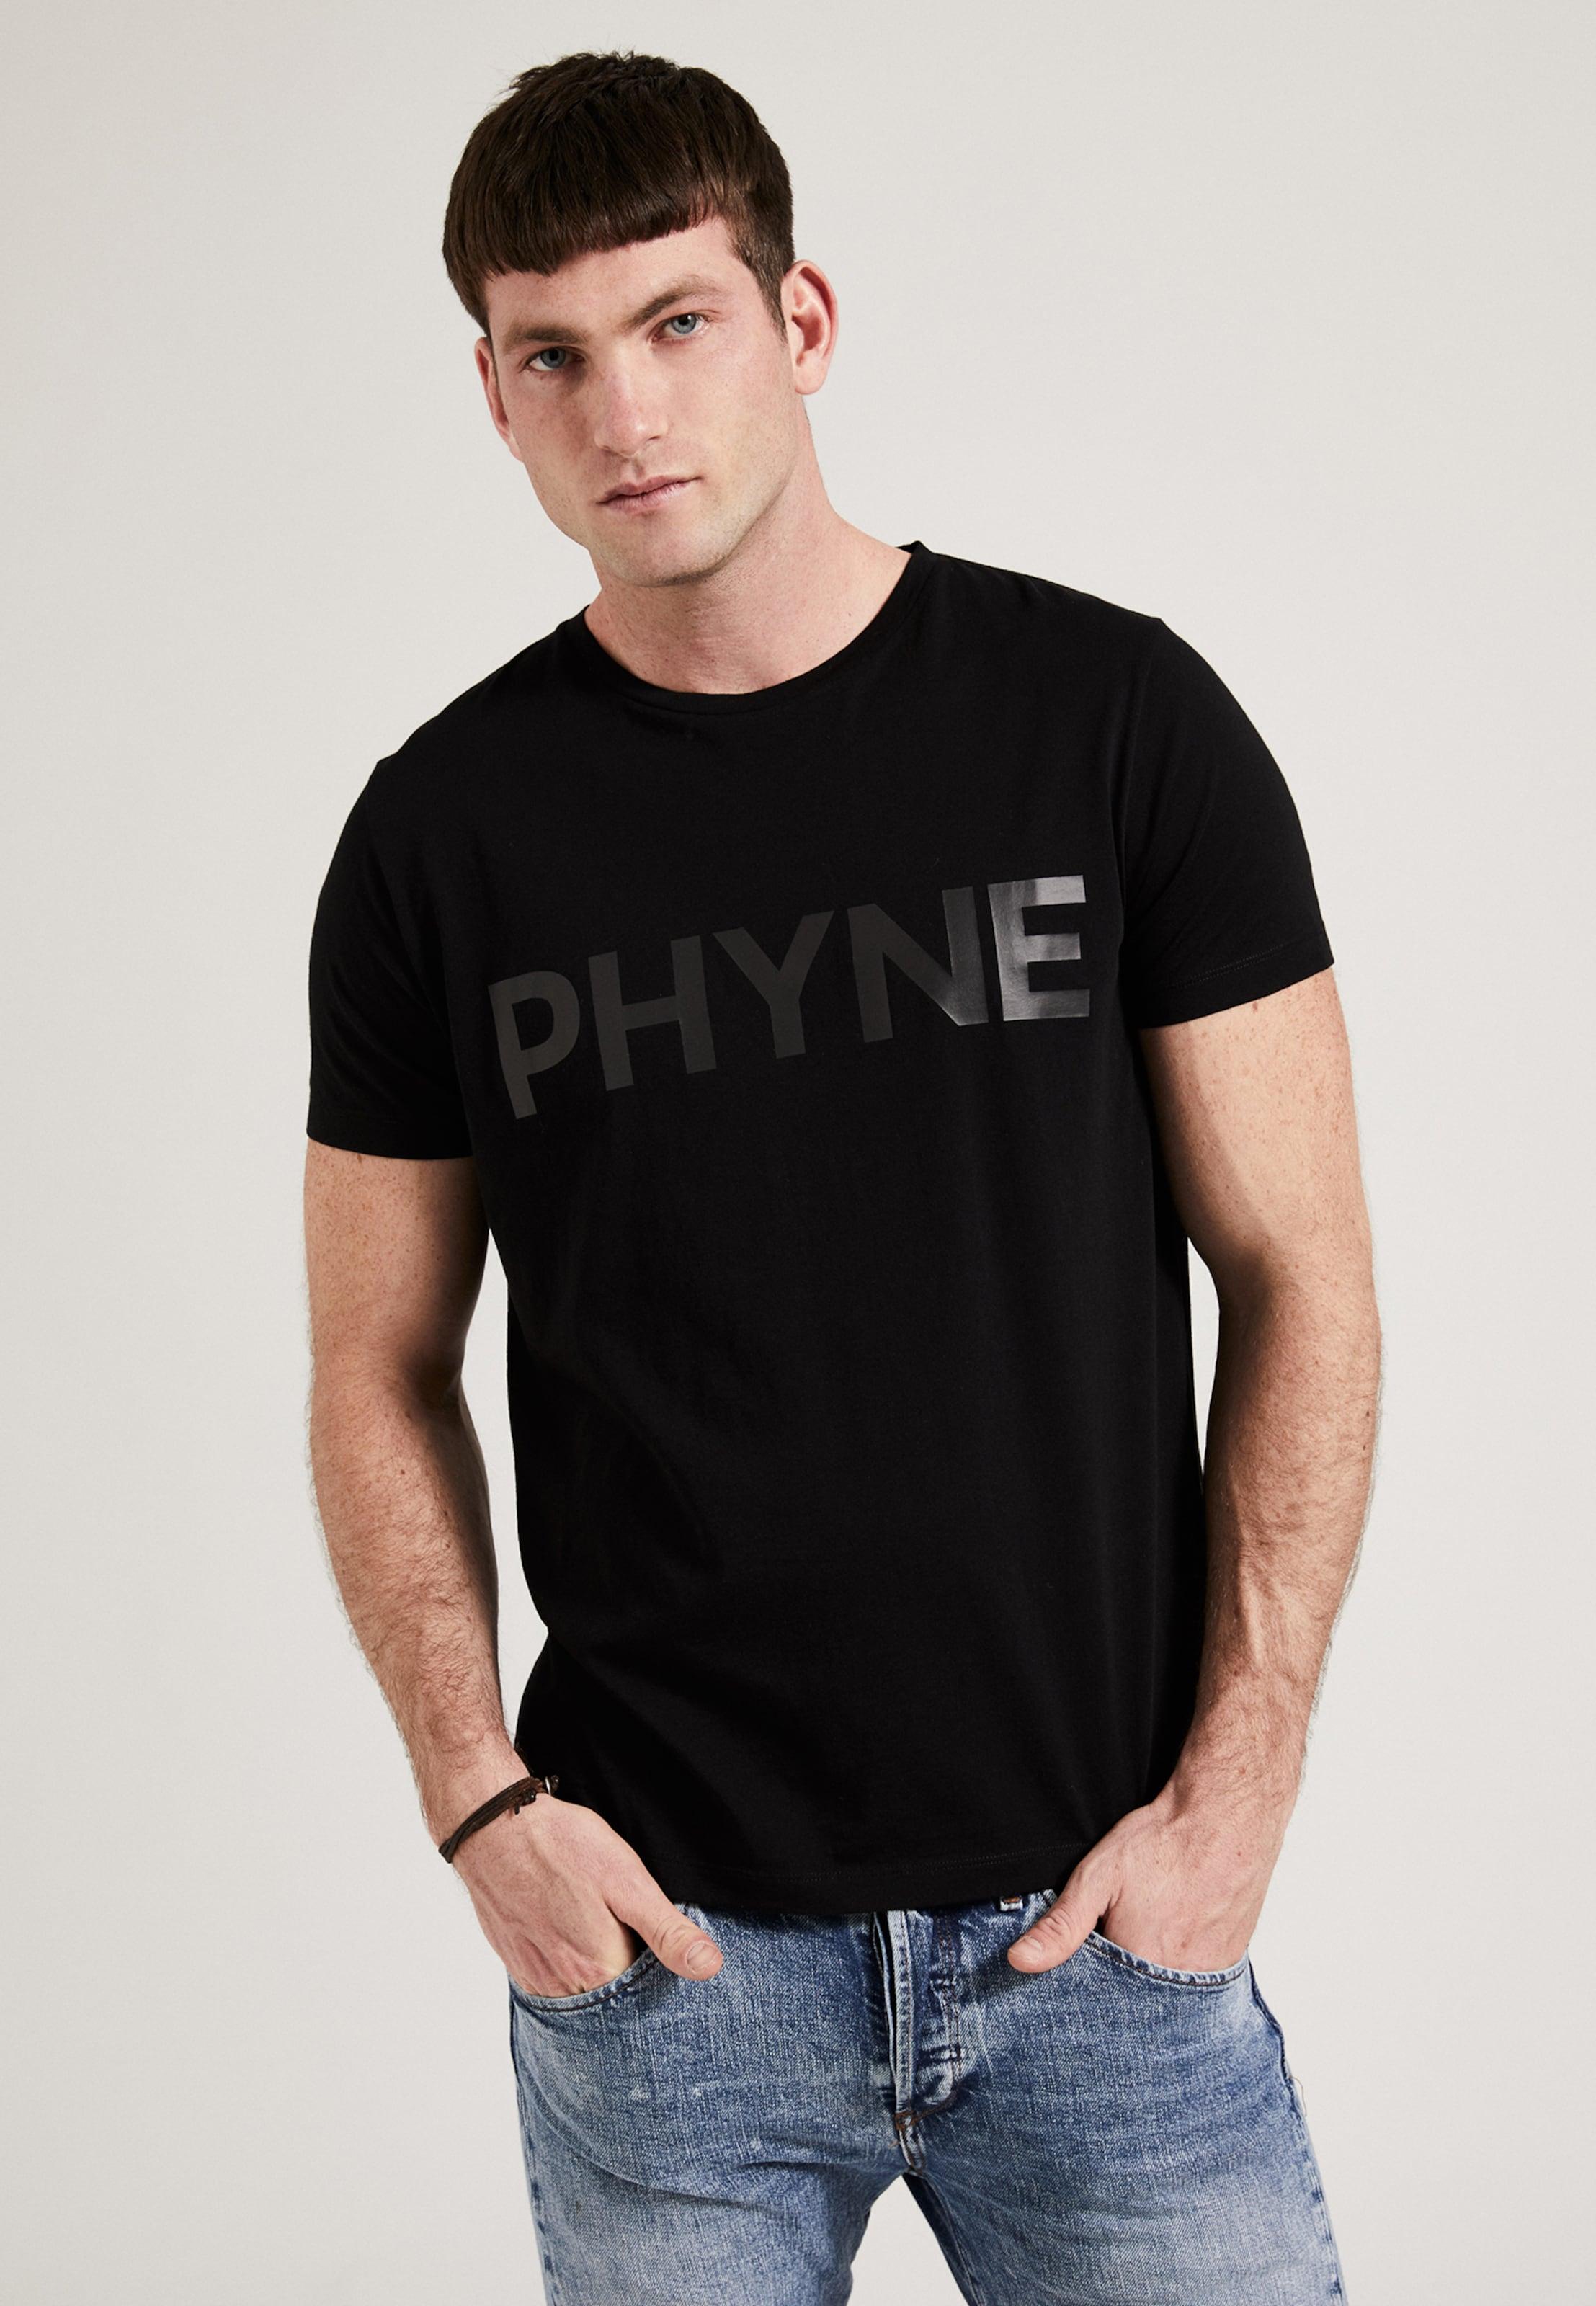 Phyne shirt GrisNoir En T pUVSzM